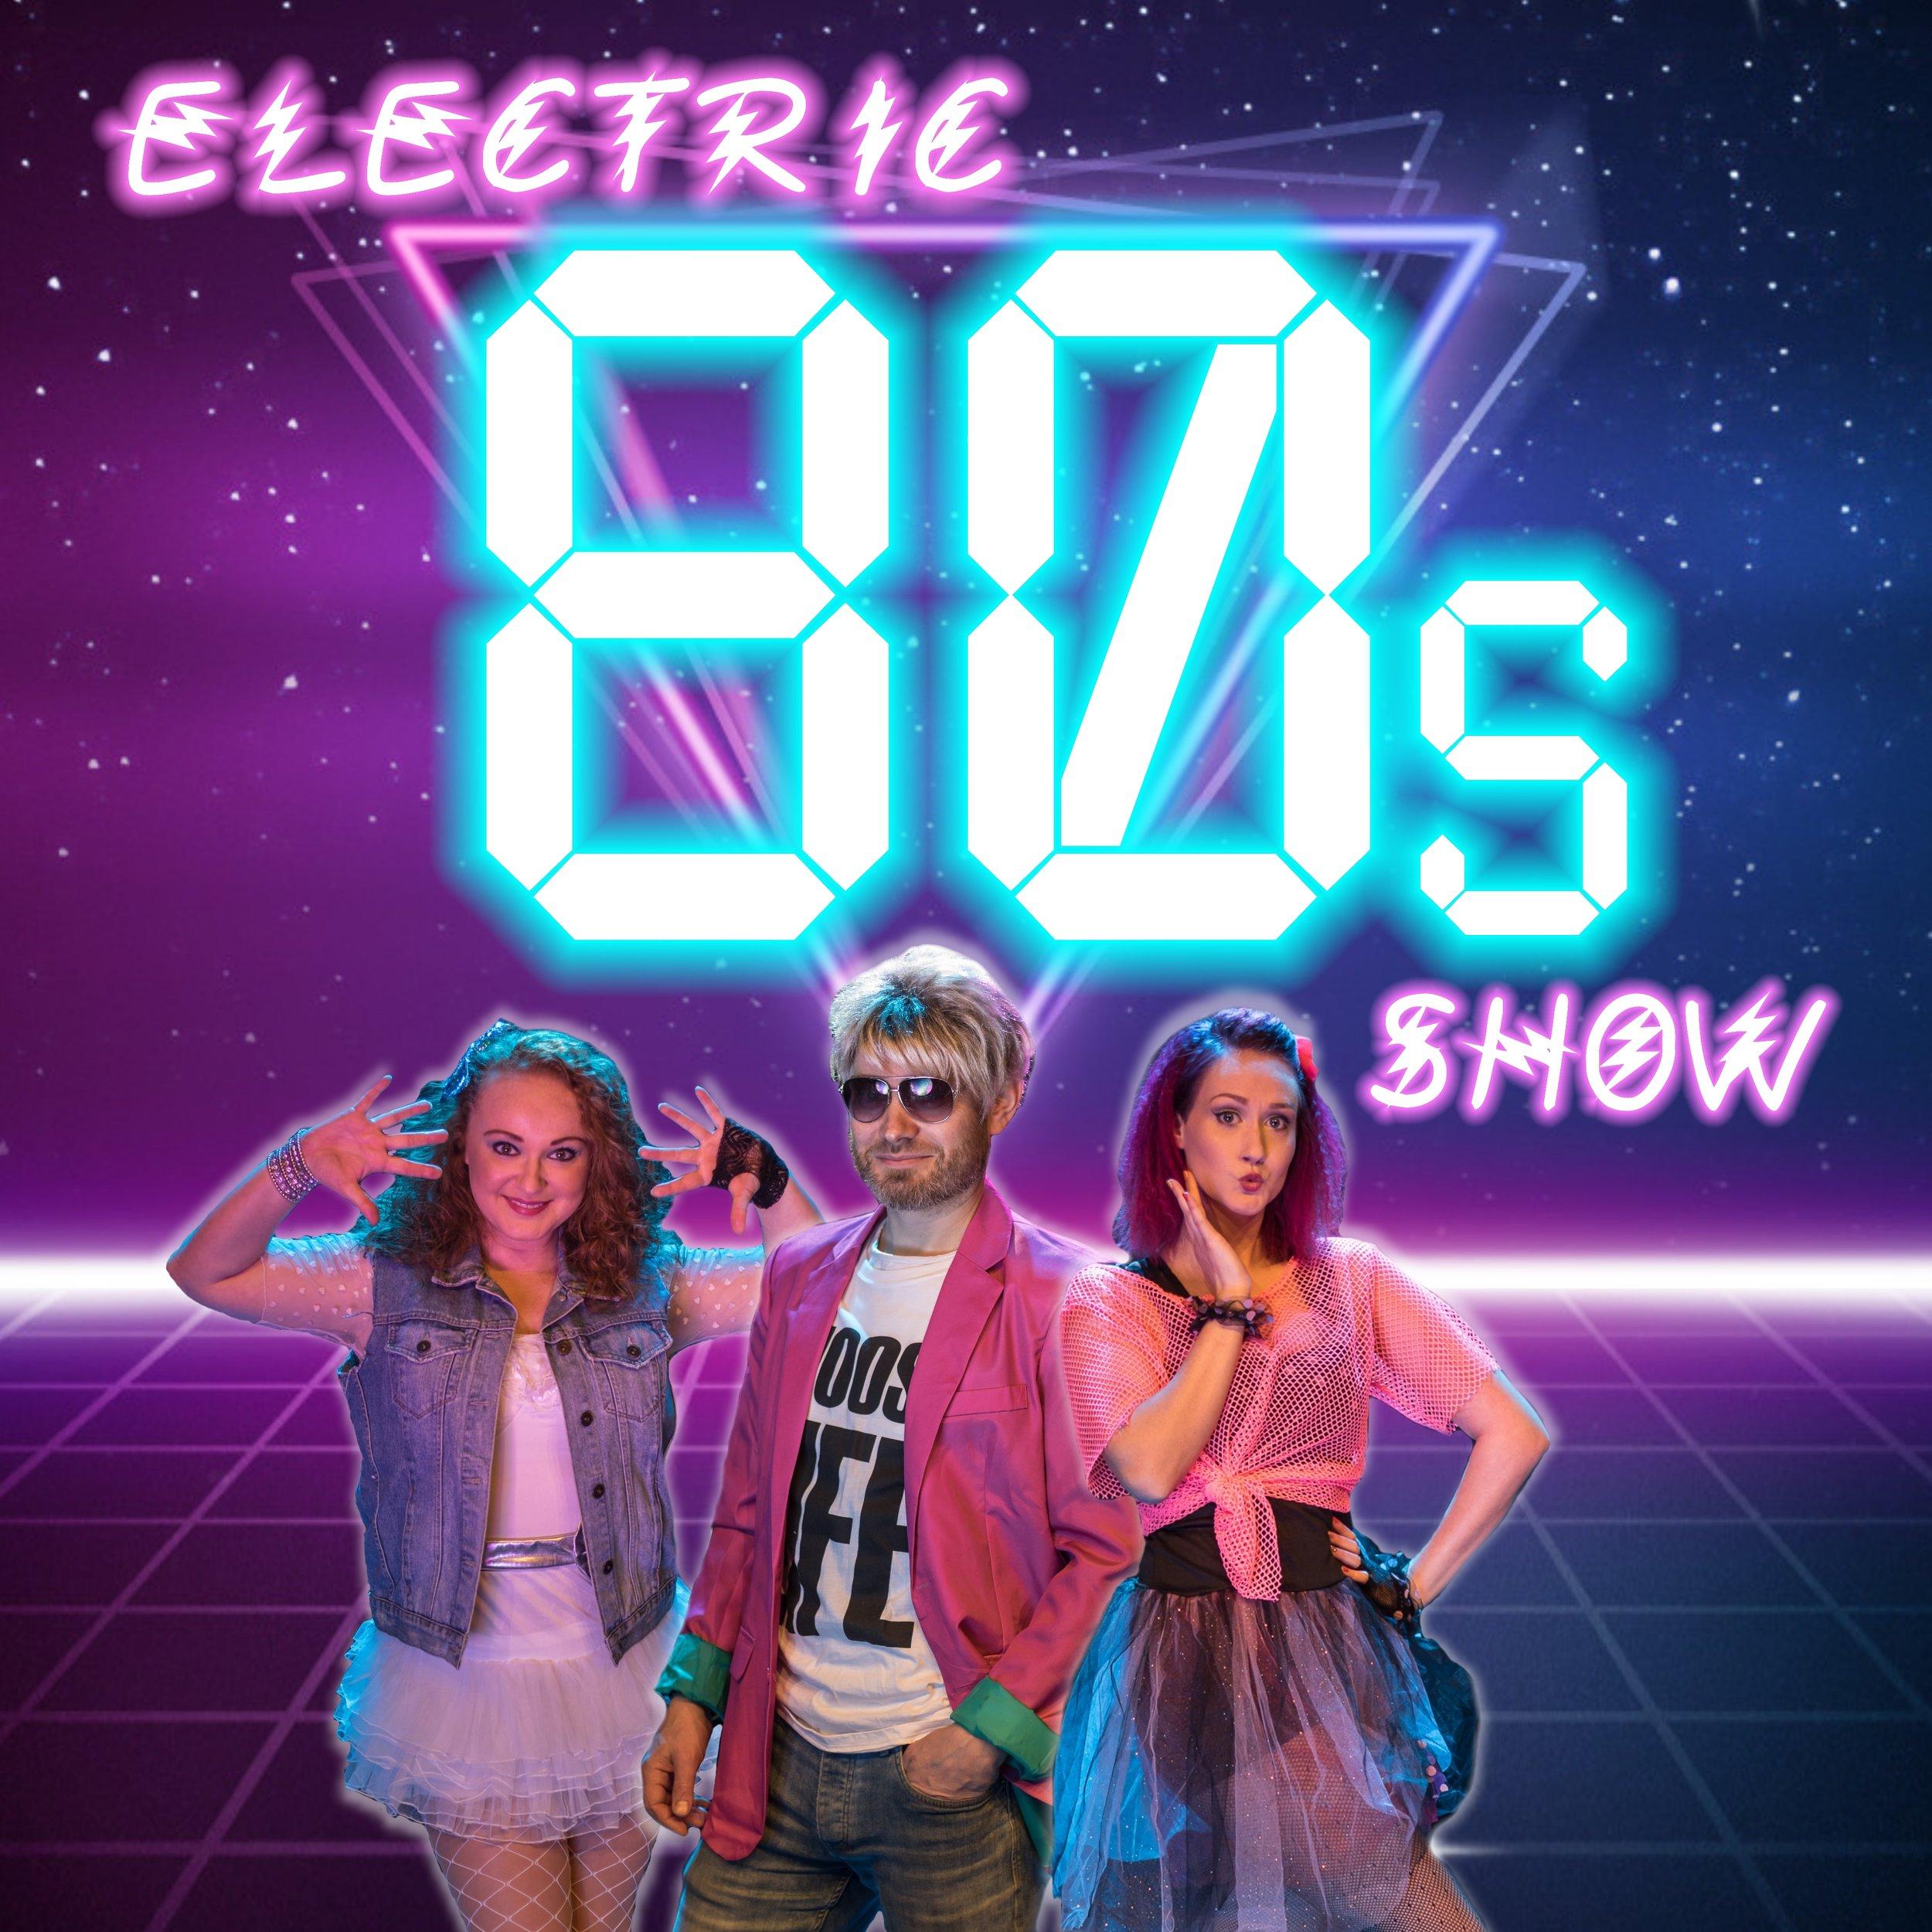 electric 80's xsp.co.uk.jpg